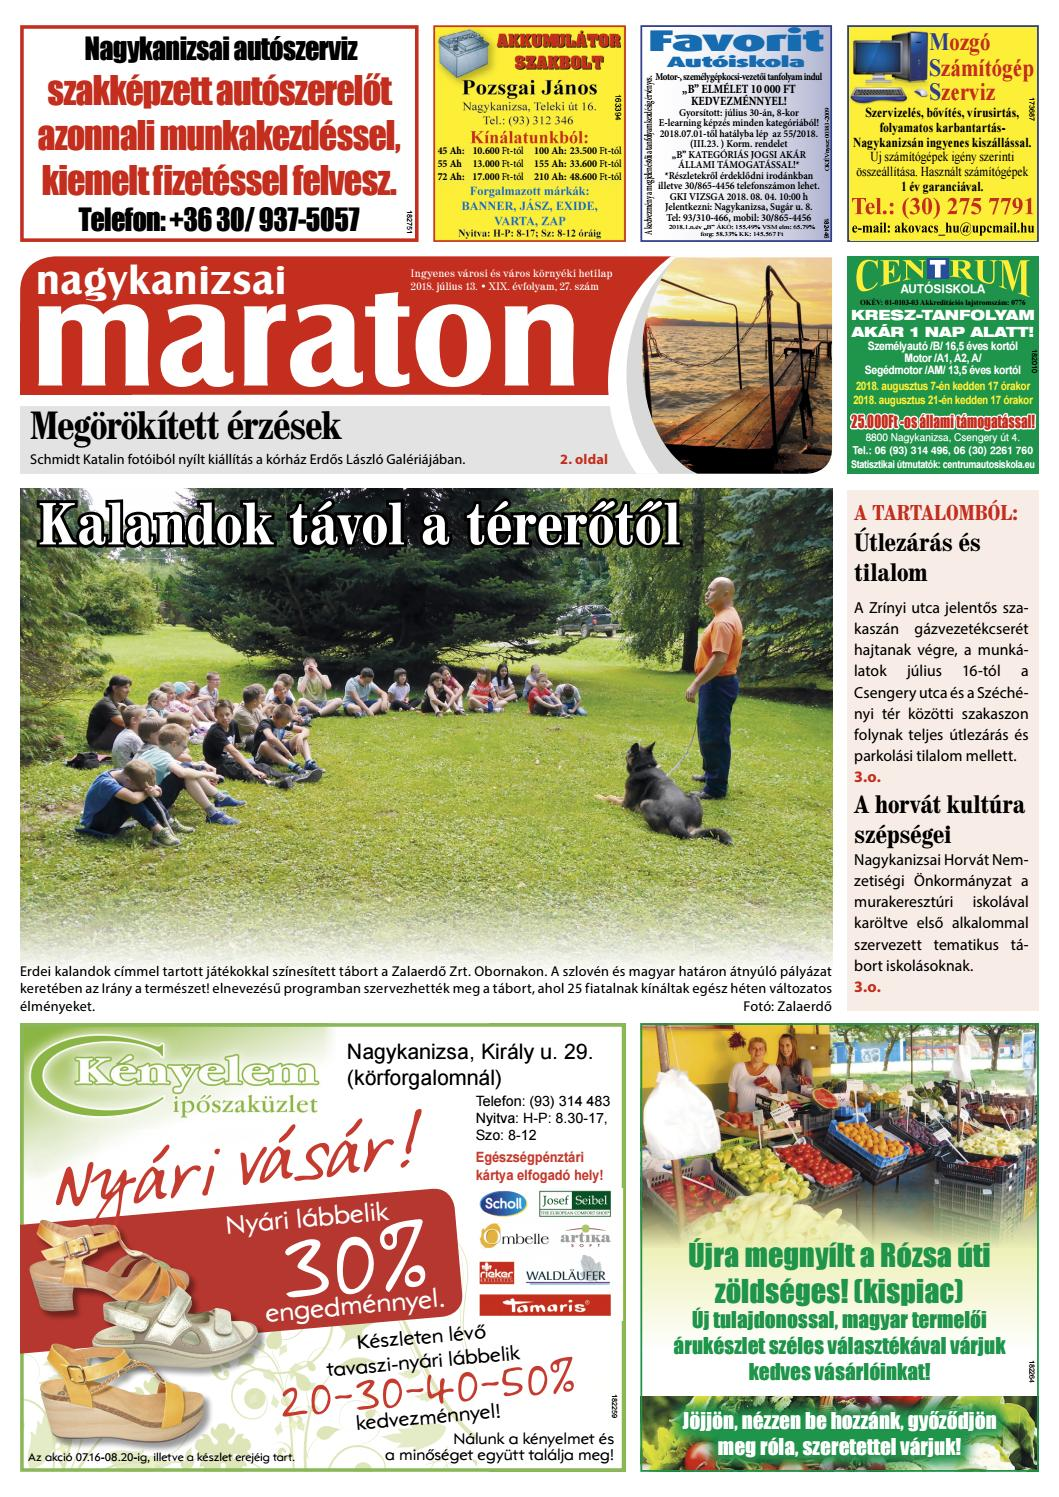 Nagykanizsai Maraton - 2018. 07. 13. by Maraton Lapcsoport Kft. - issuu 98865a99f8